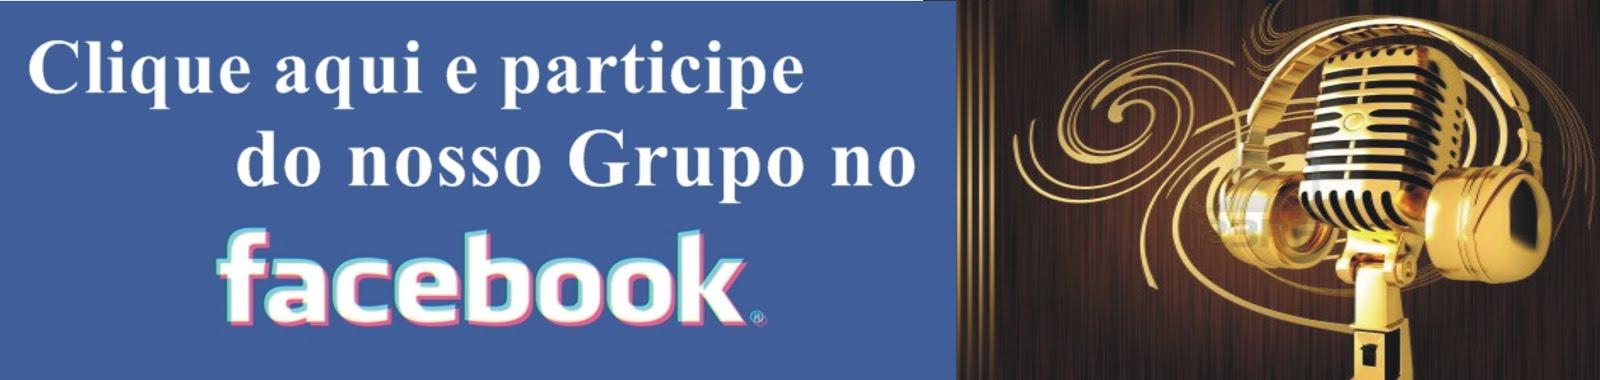 Facebook Blog Dos Radialistas